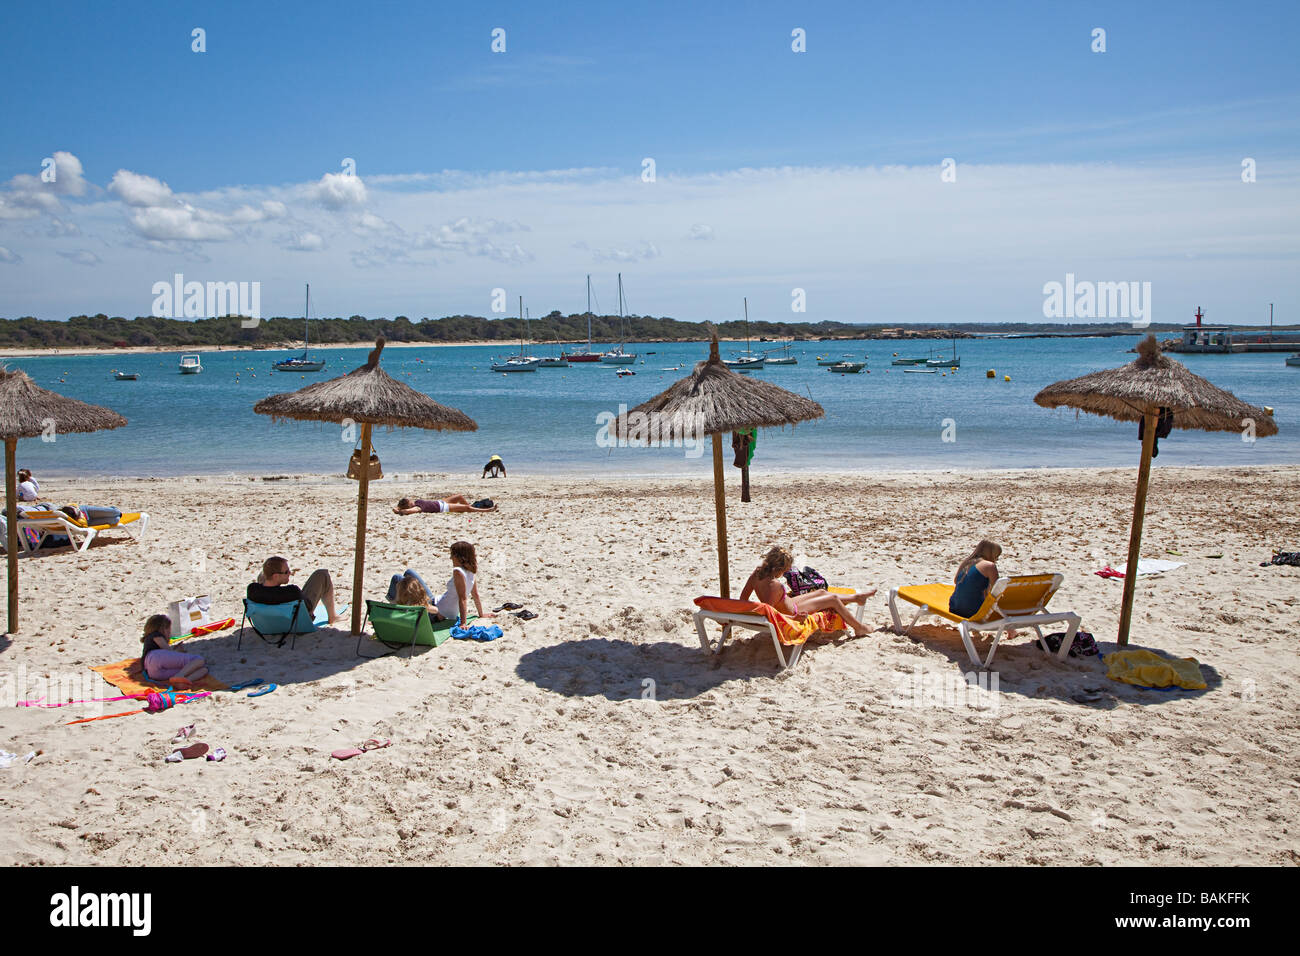 Menschen unter Schatten Sonnenschirme am Strand Colonia de Sant Jordi-Mallorca-Spanien Stockbild